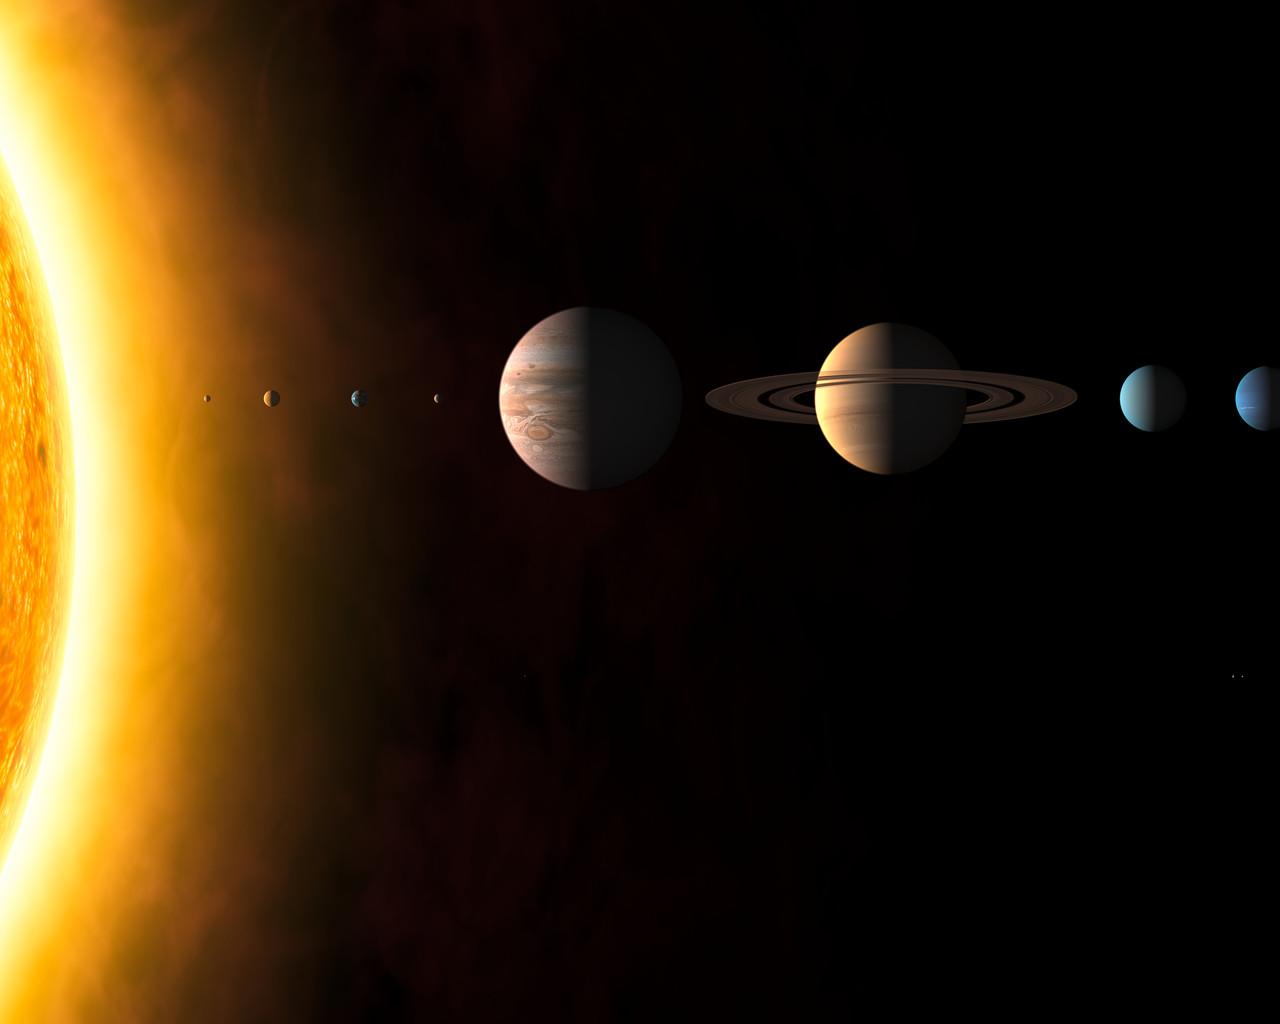 hubble telescope solar system - photo #32